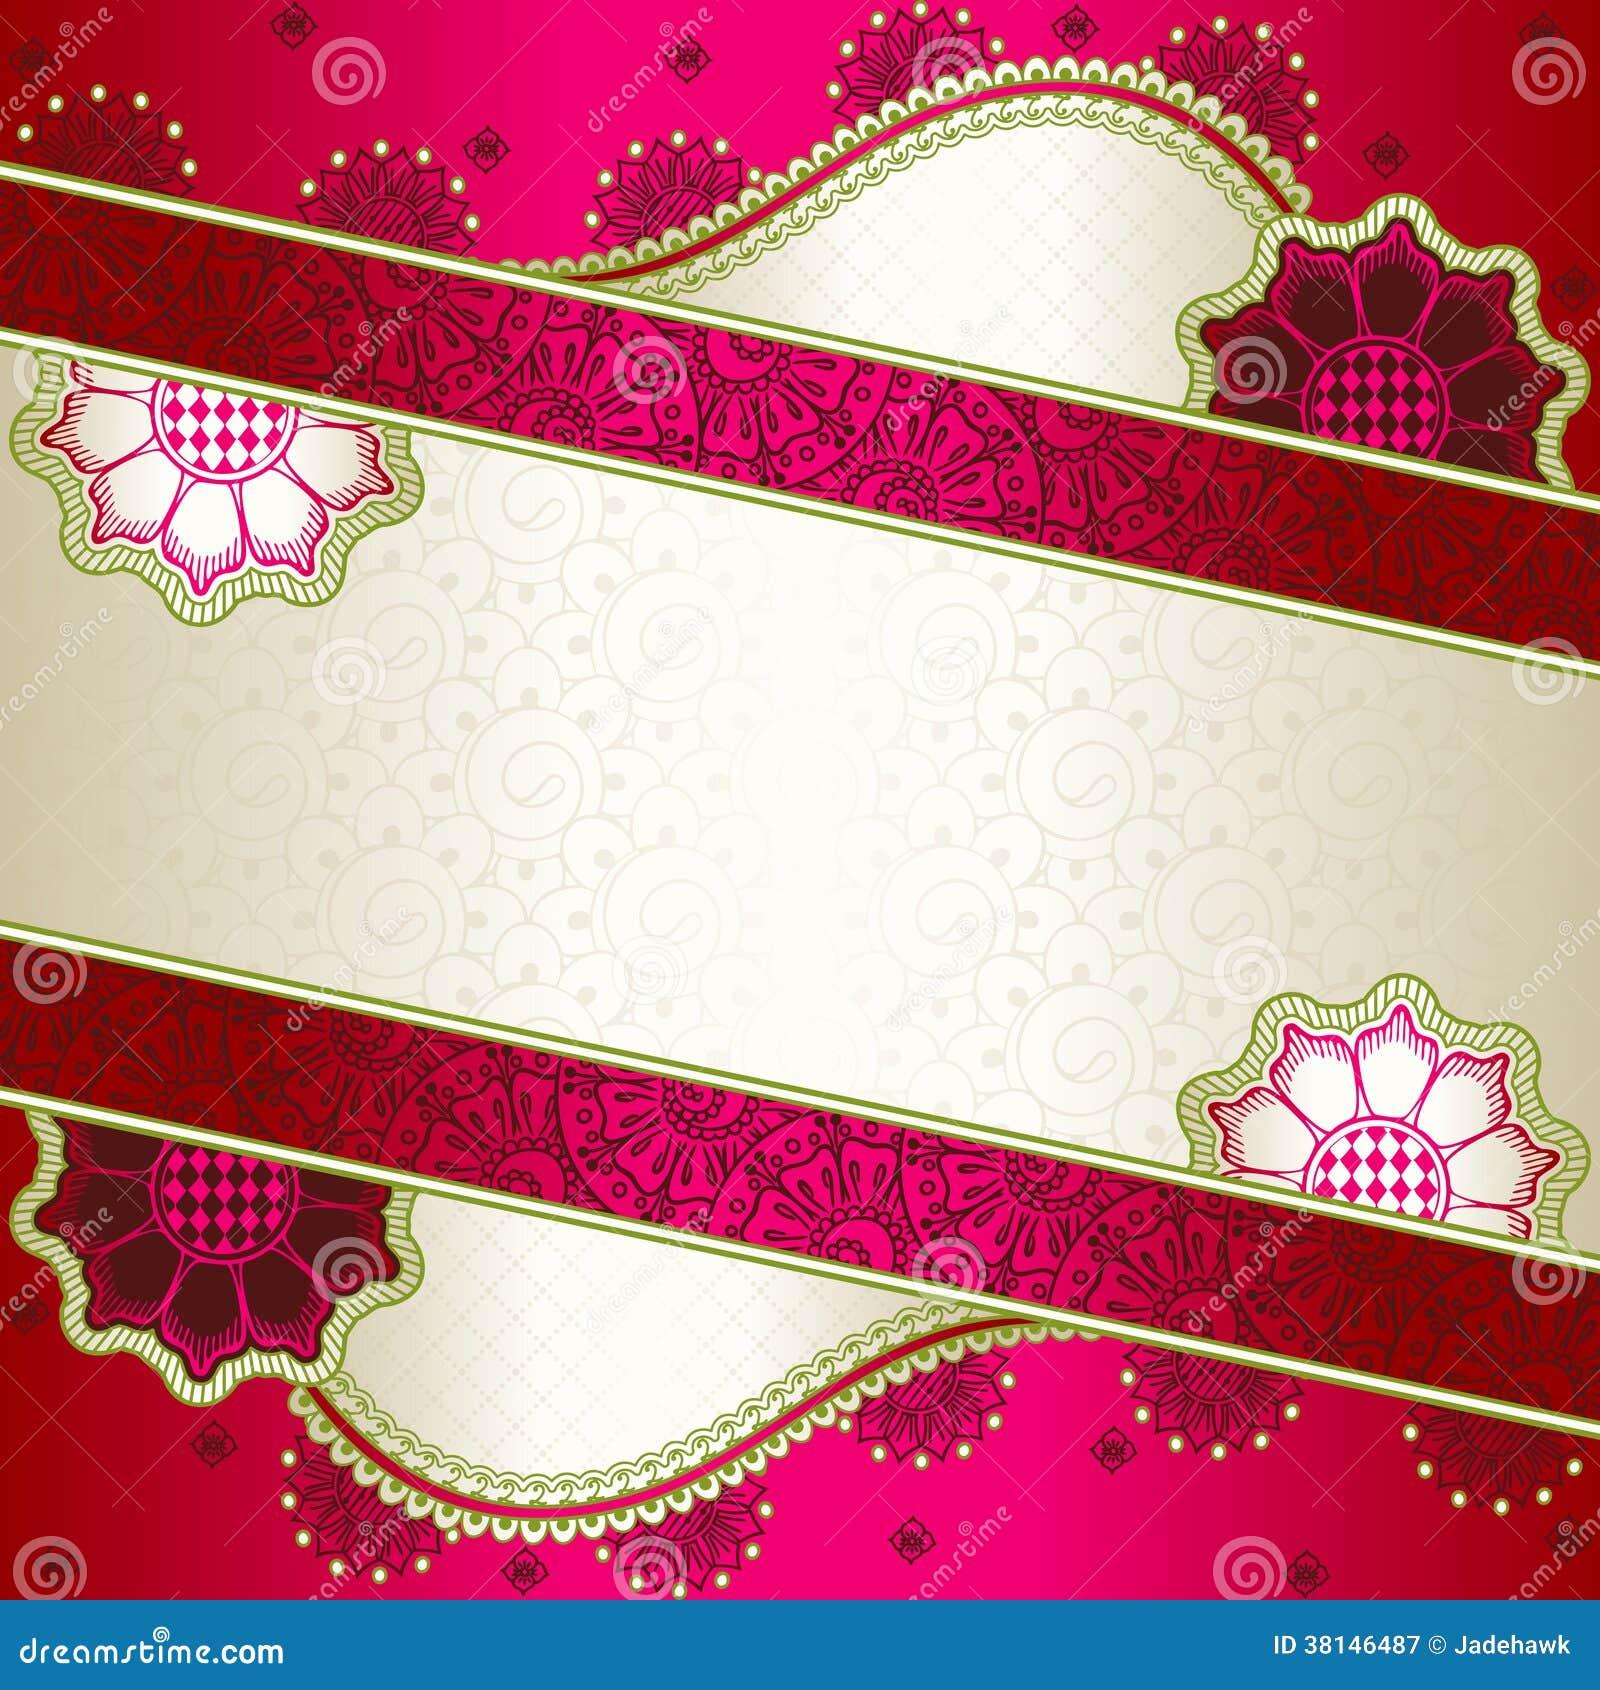 henna inspired banners borders - photo #24